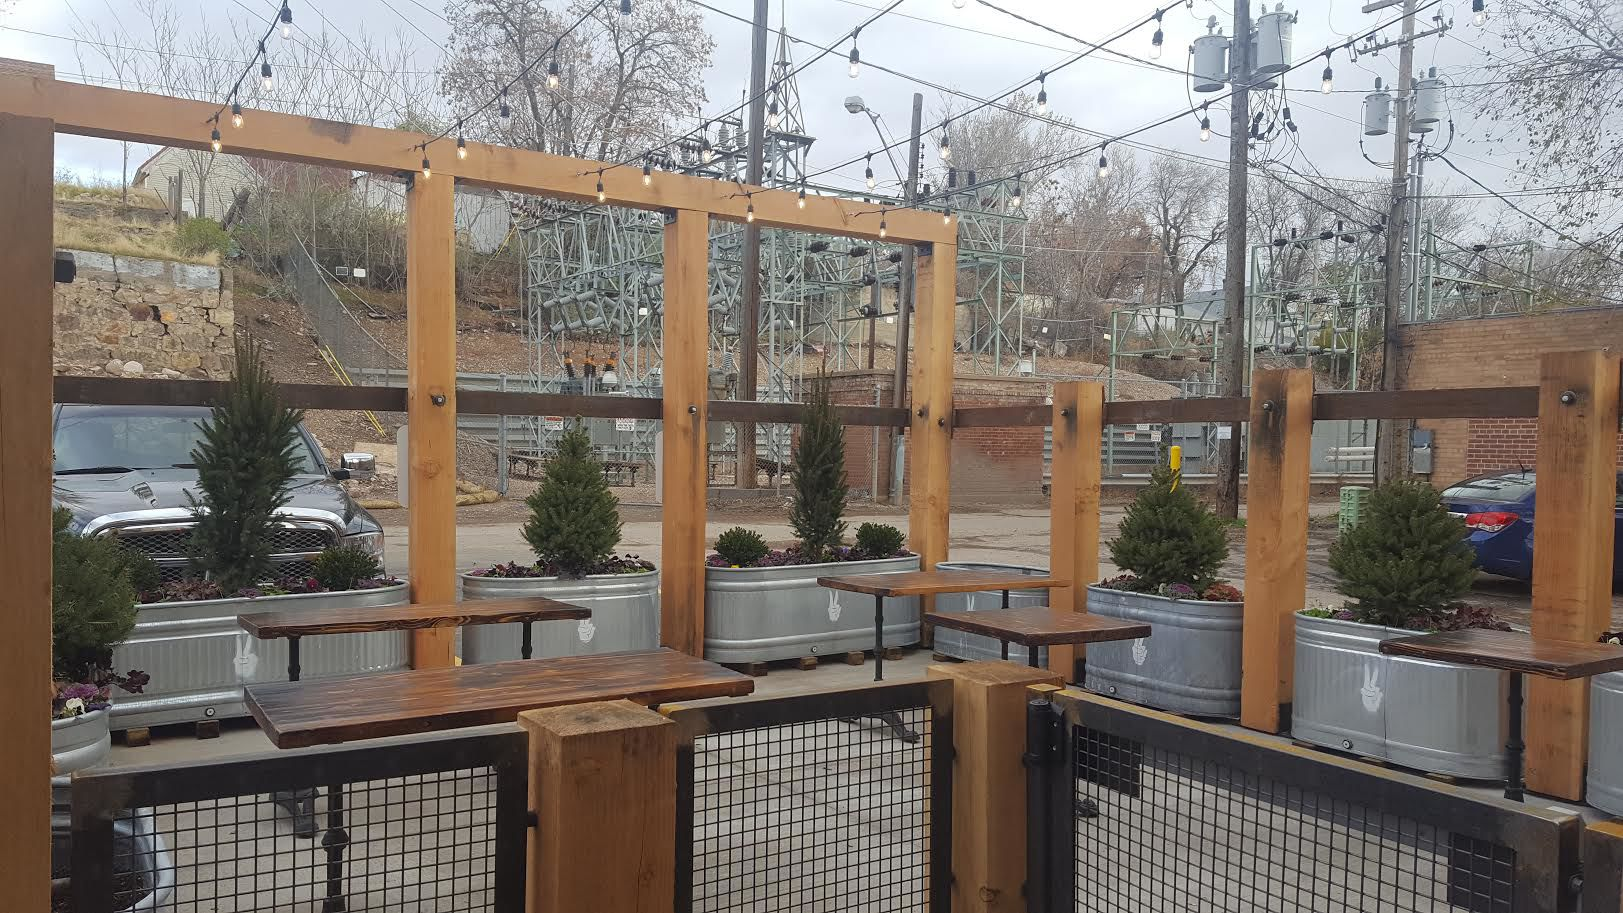 17 restaurants, bars with outdoor seating in Ogden, Layton, Farmington, more